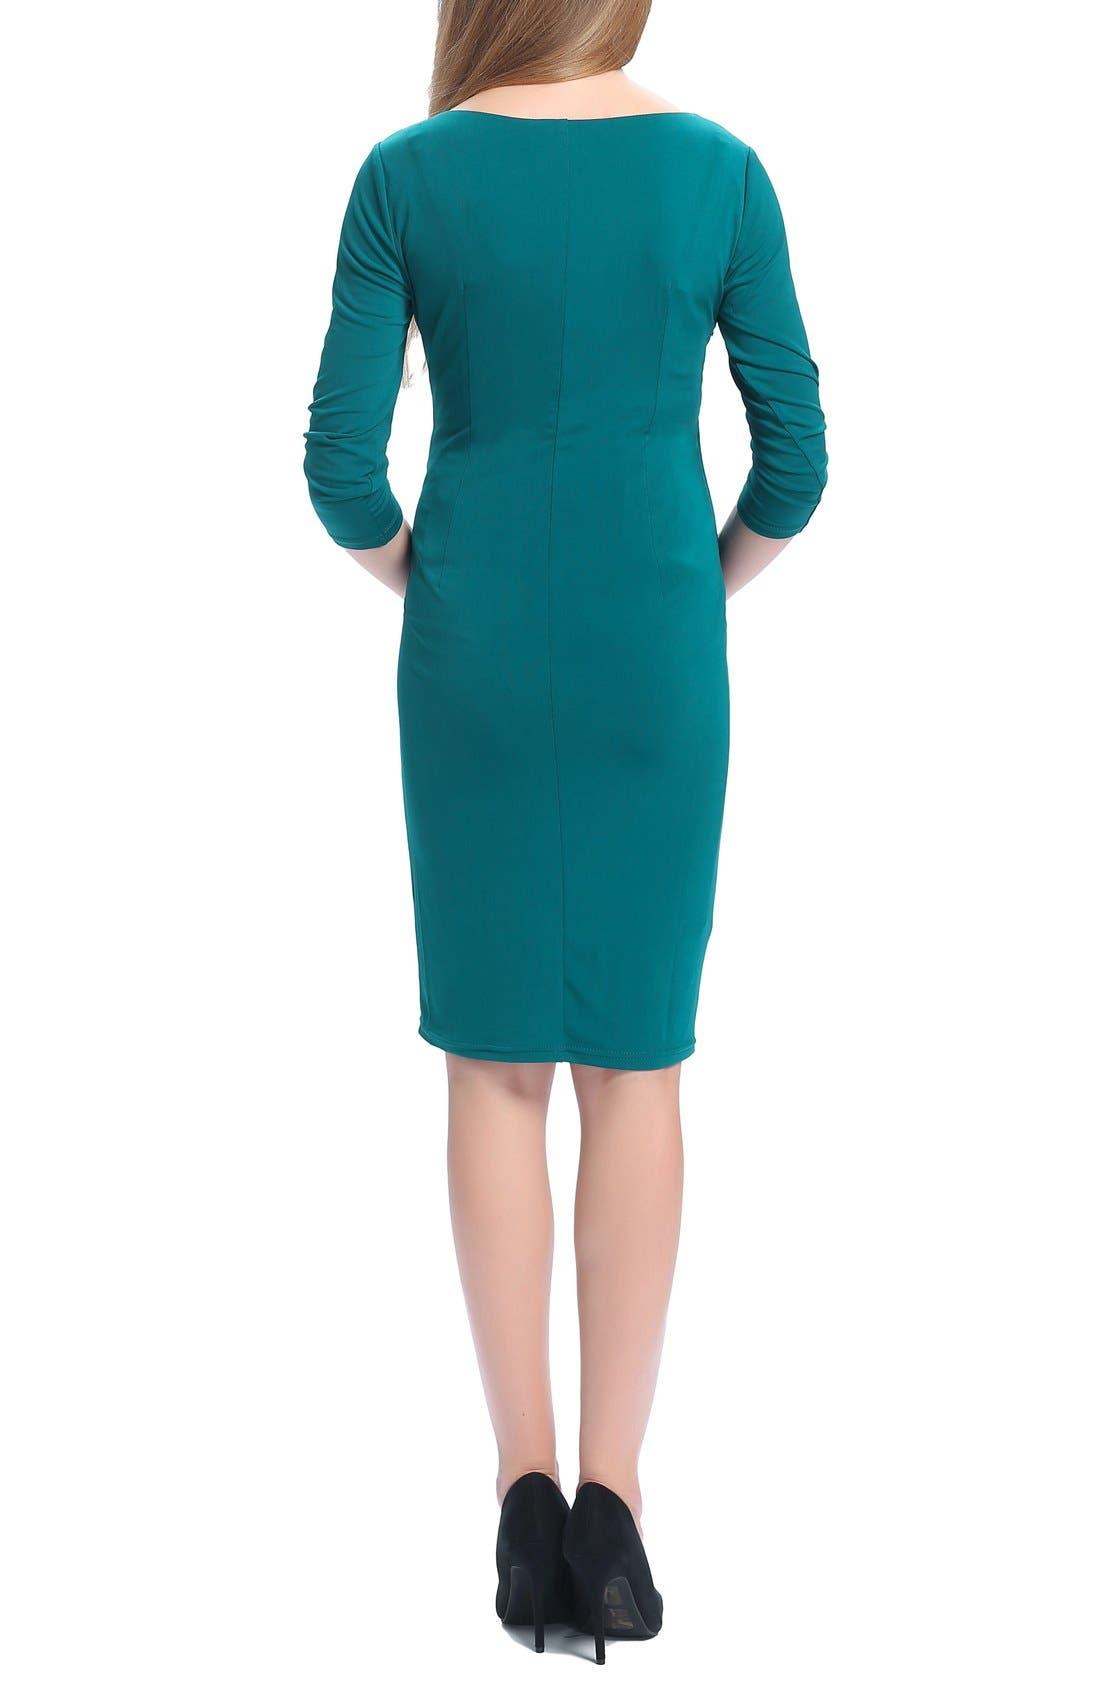 Teagan Body-Con Maternity Dress,                             Alternate thumbnail 4, color,                             TEAL